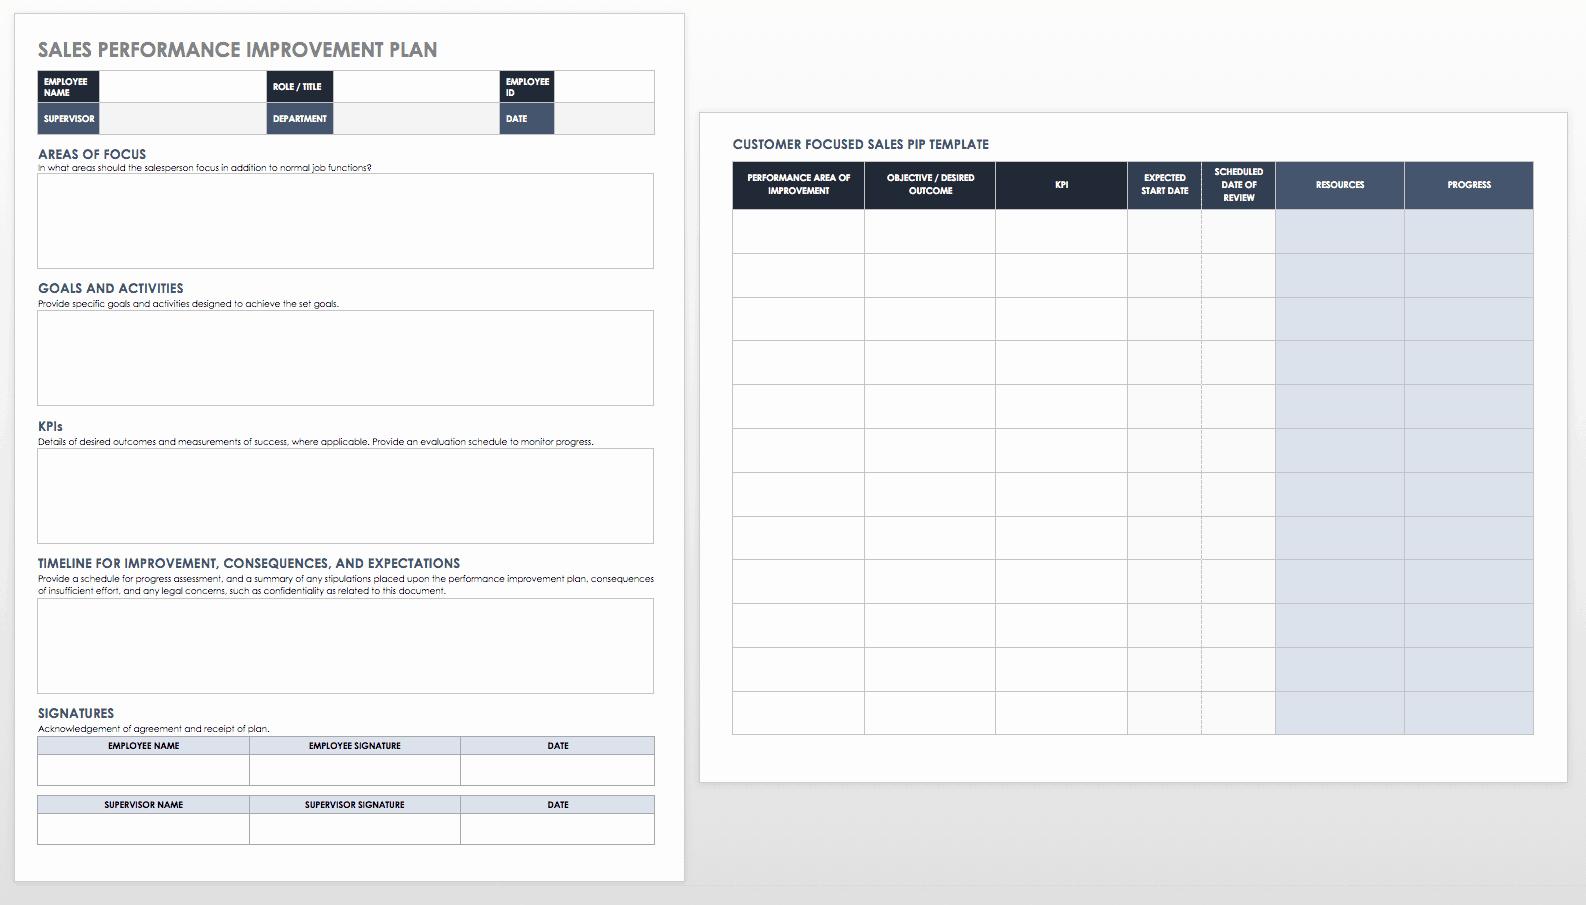 Process Improvement Plan Templates Elegant Performance Improvement Plan Templates